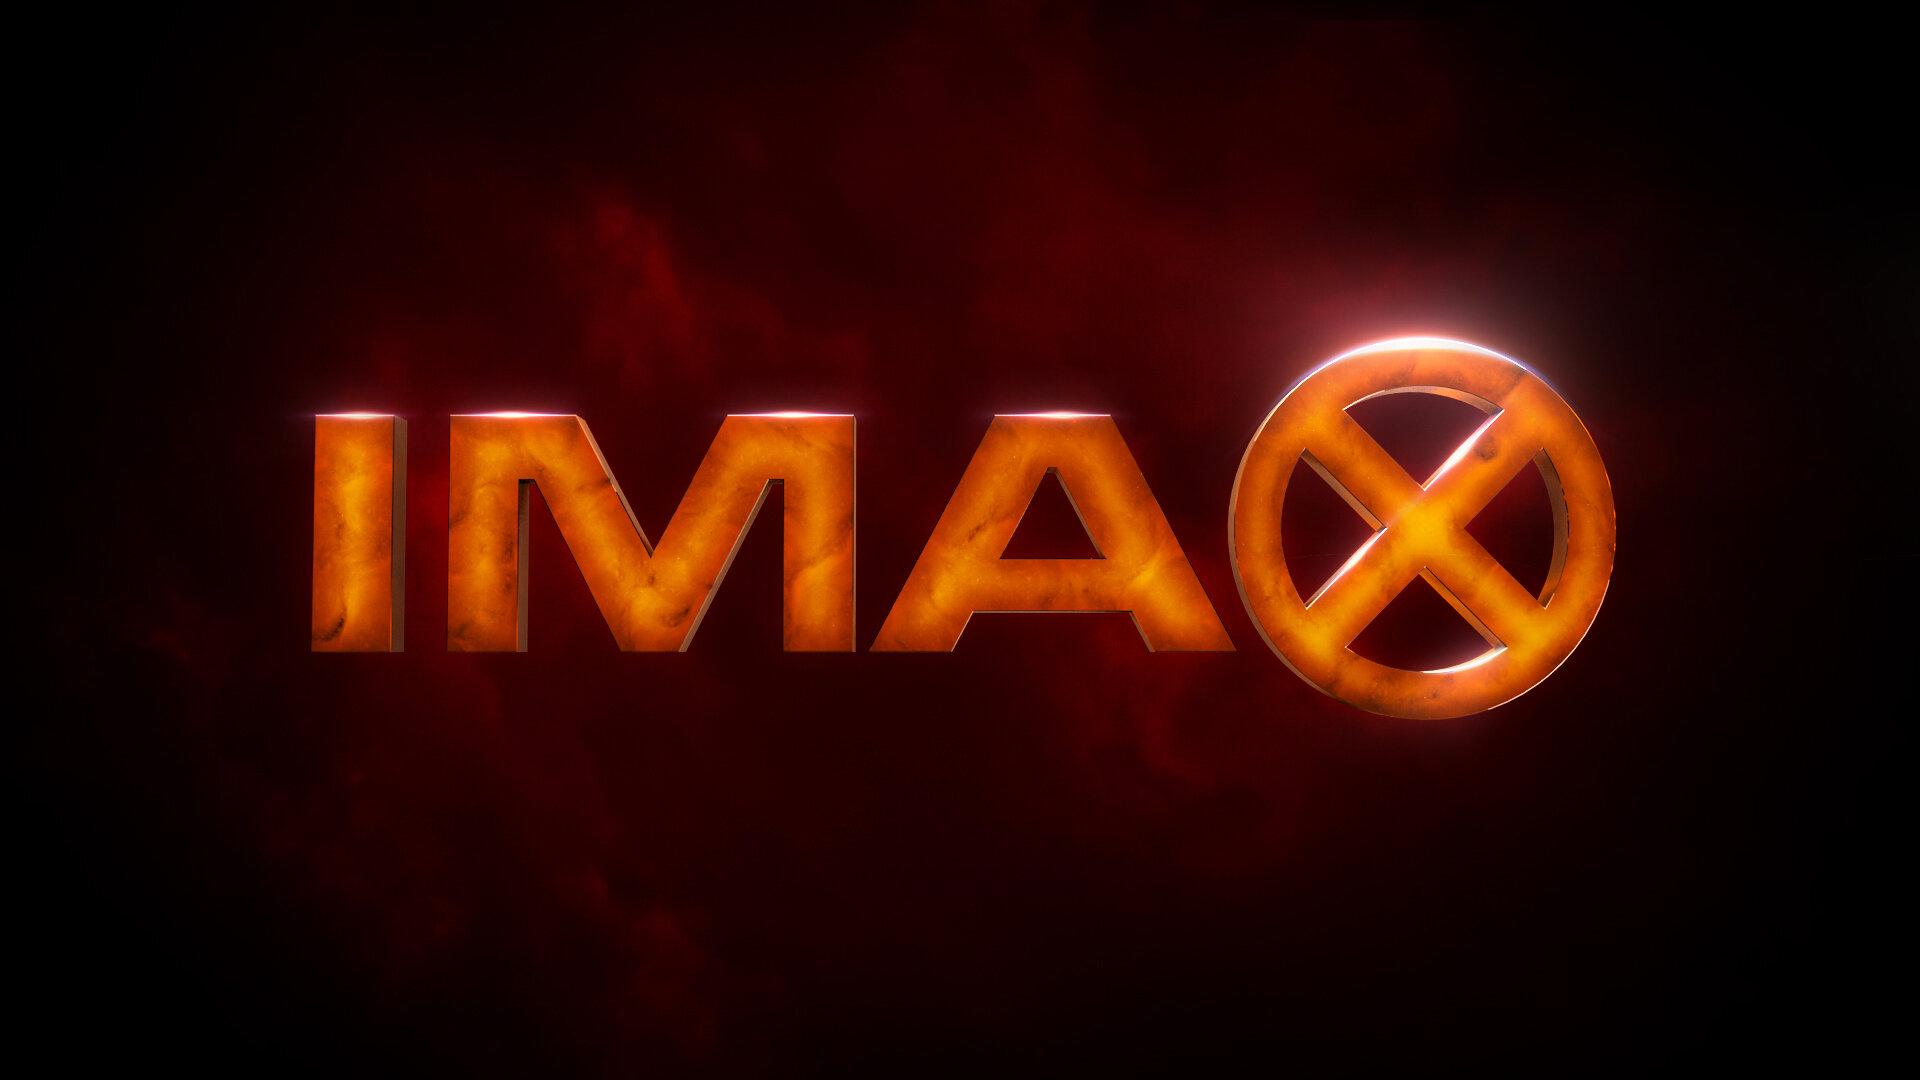 IMAX_DP_BL_03_06.jpg